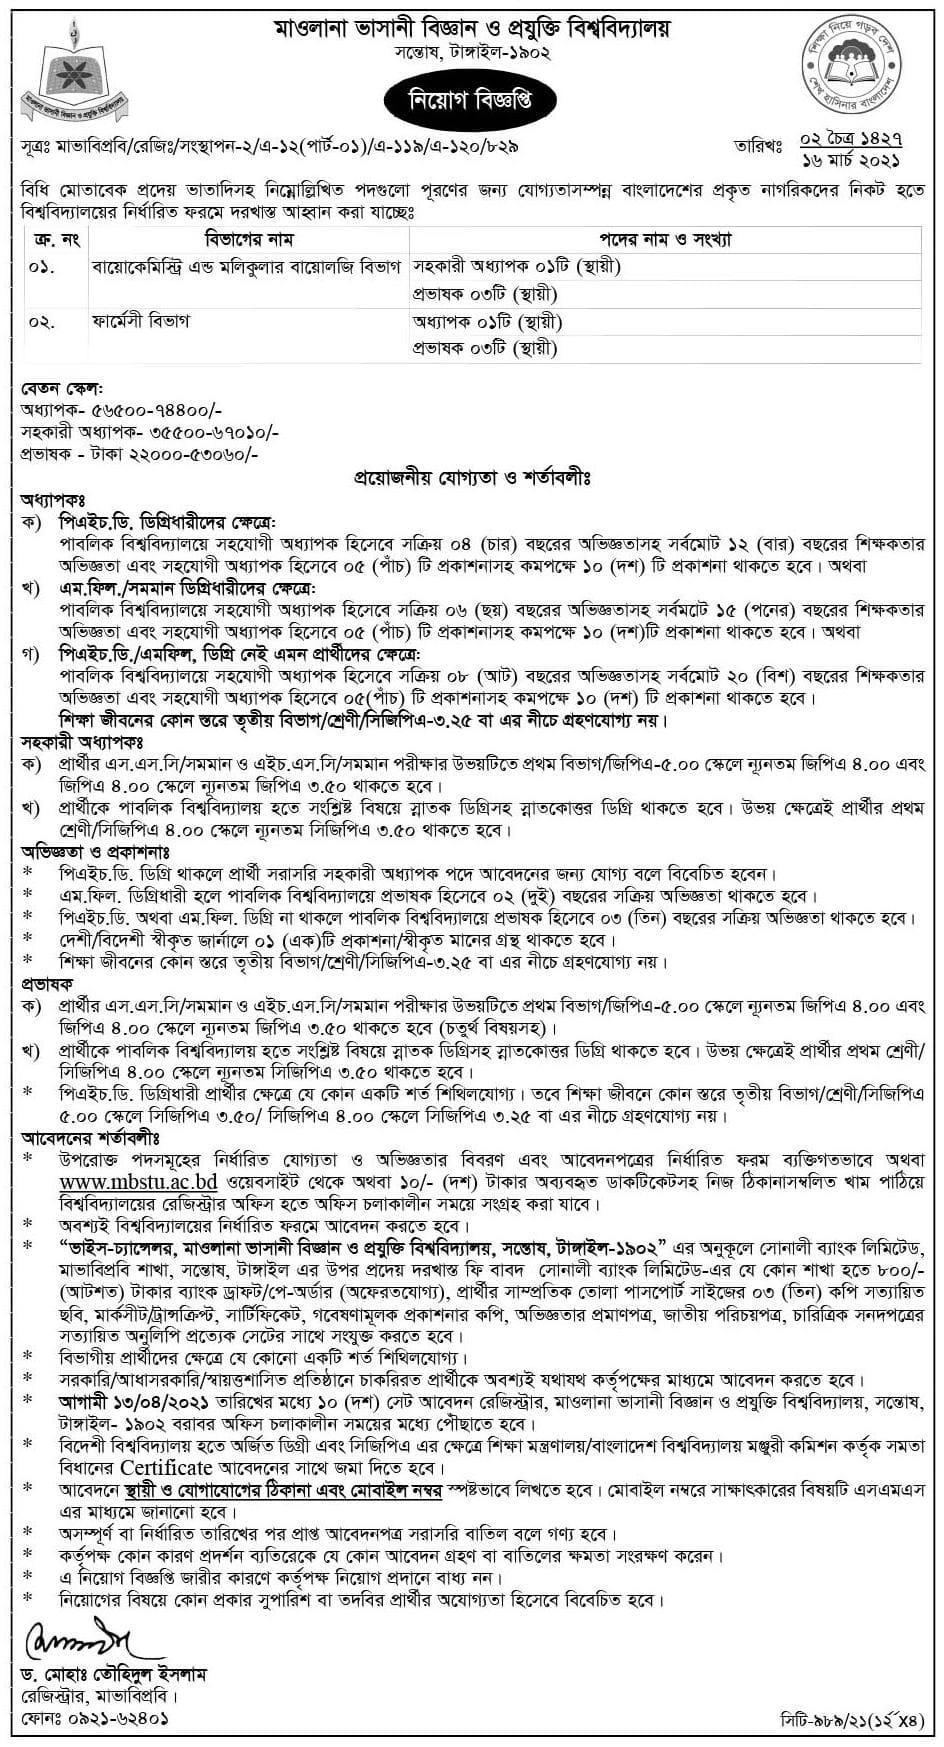 Mawlana Bhashani Science and Technology University Job Circular